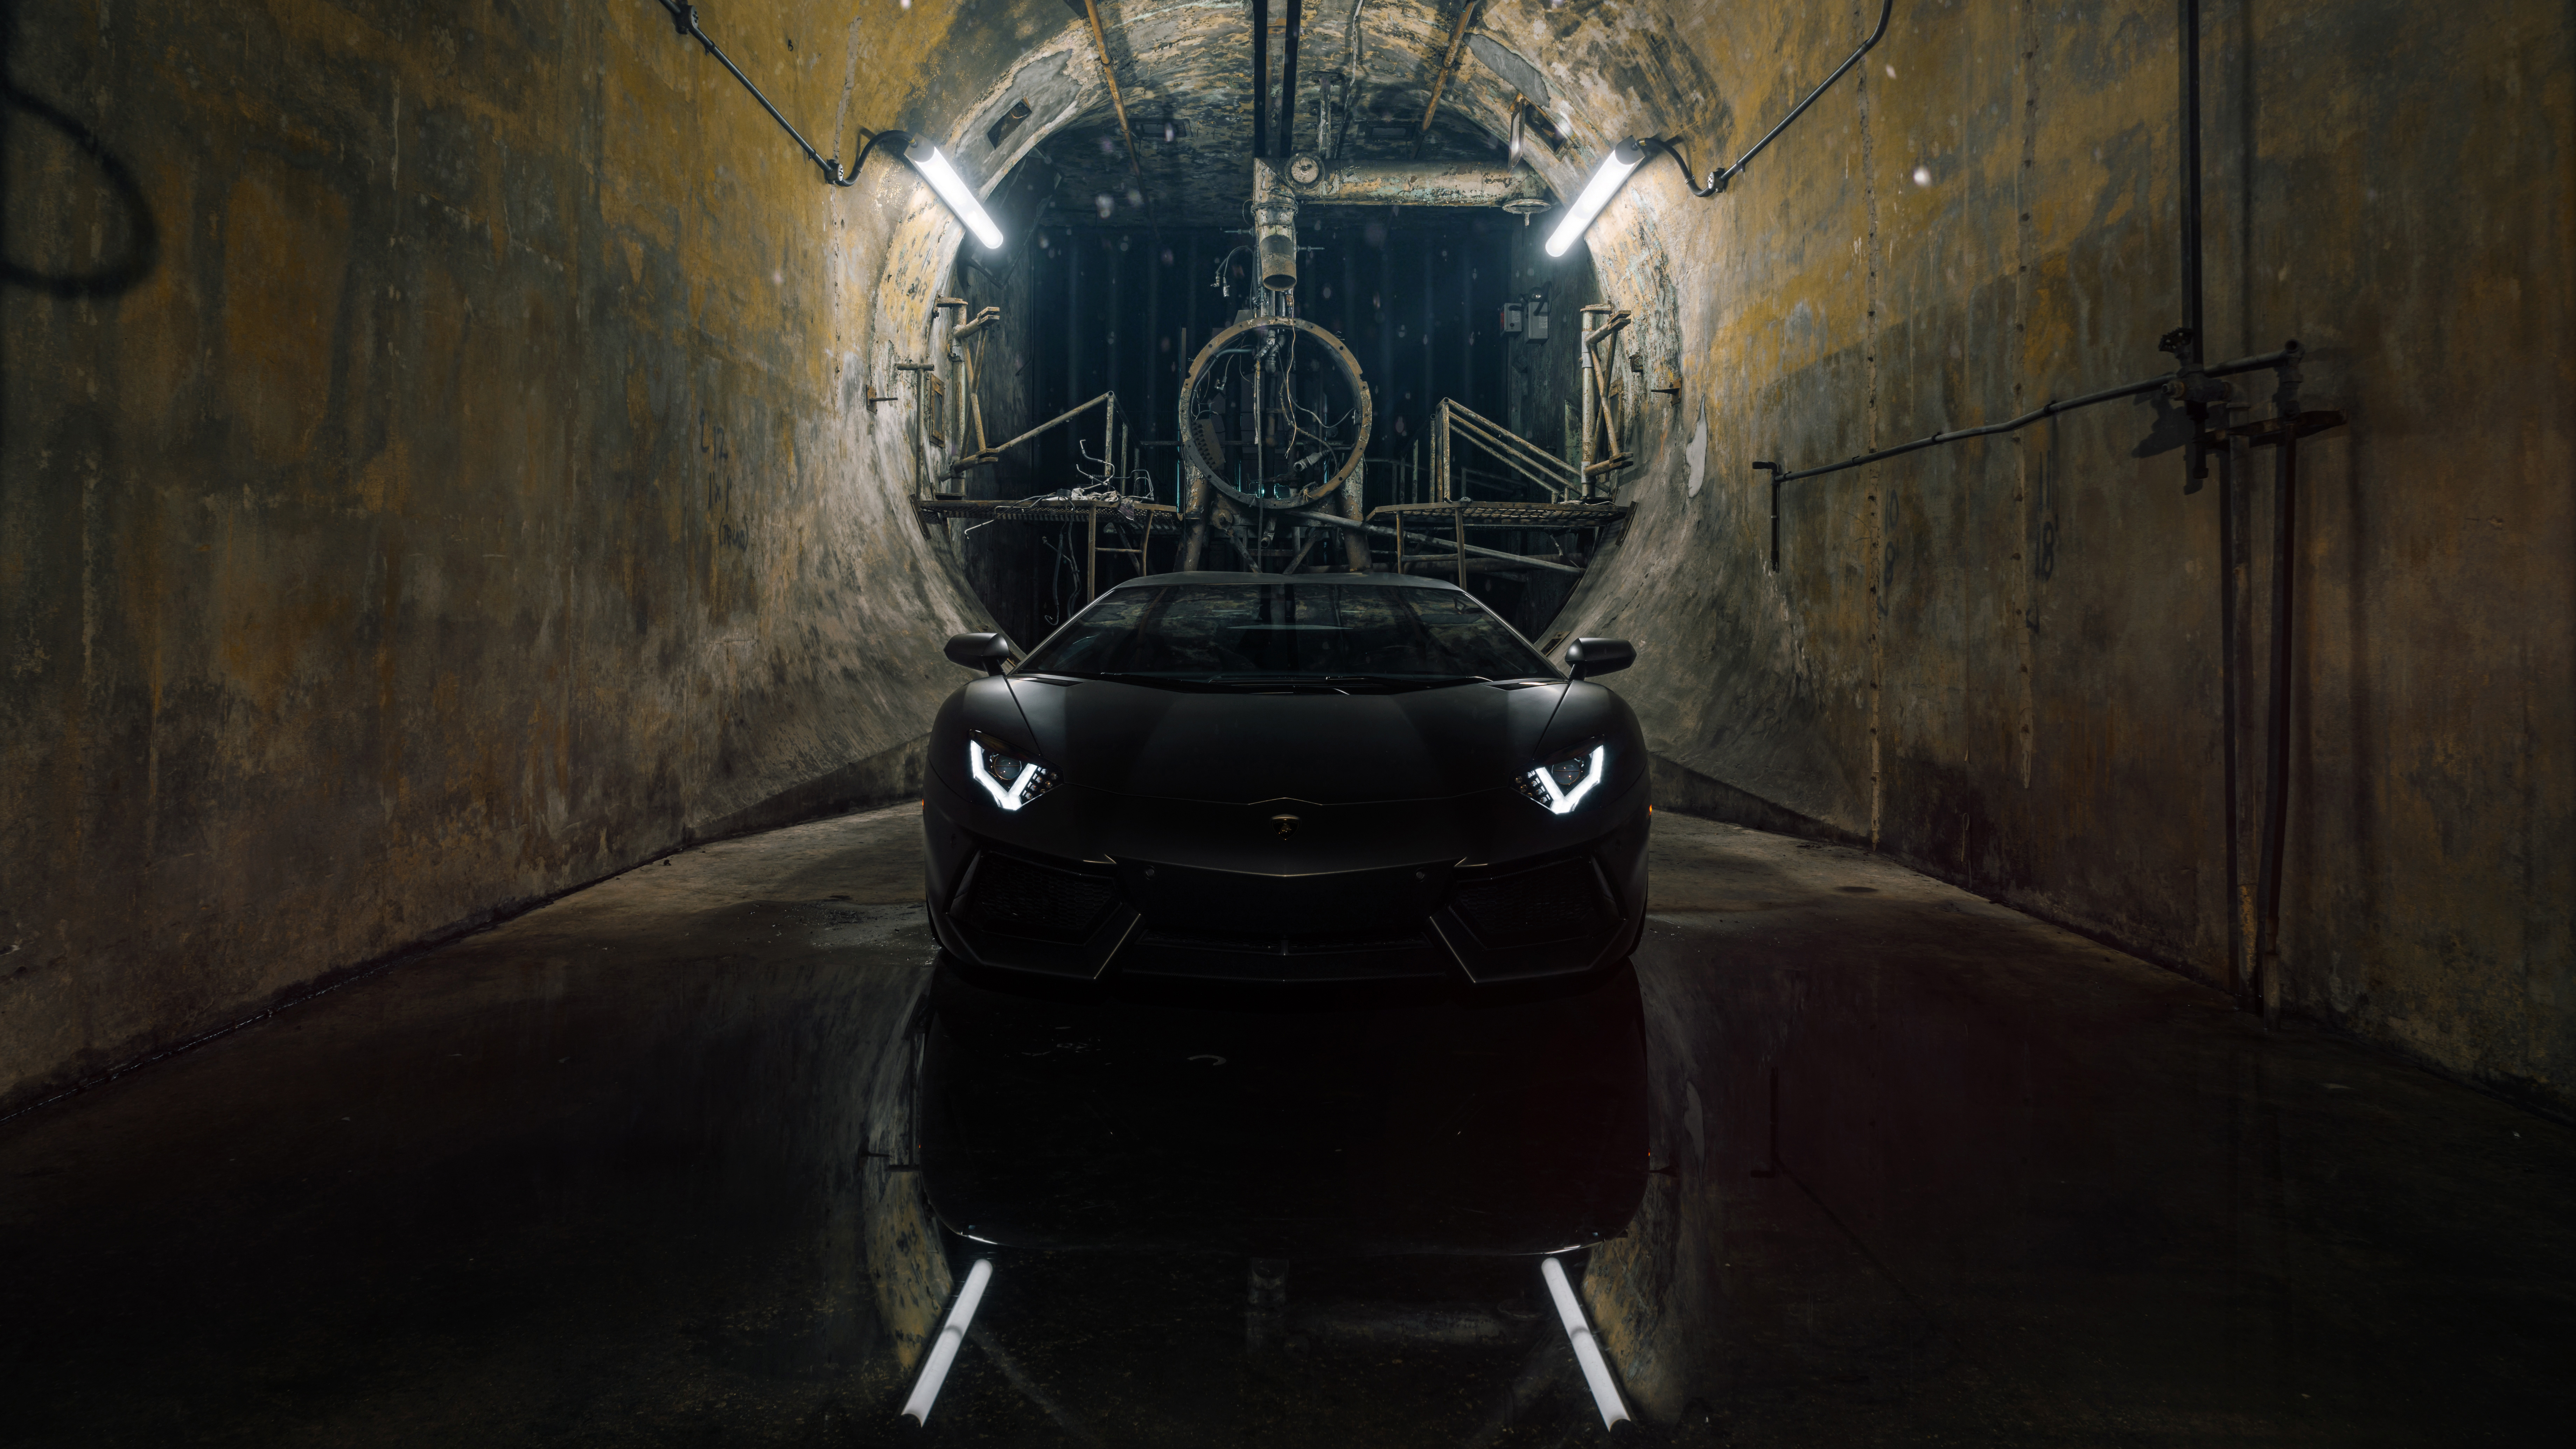 Black Lamborghini Aventador HD Cars 4k Wallpapers Images